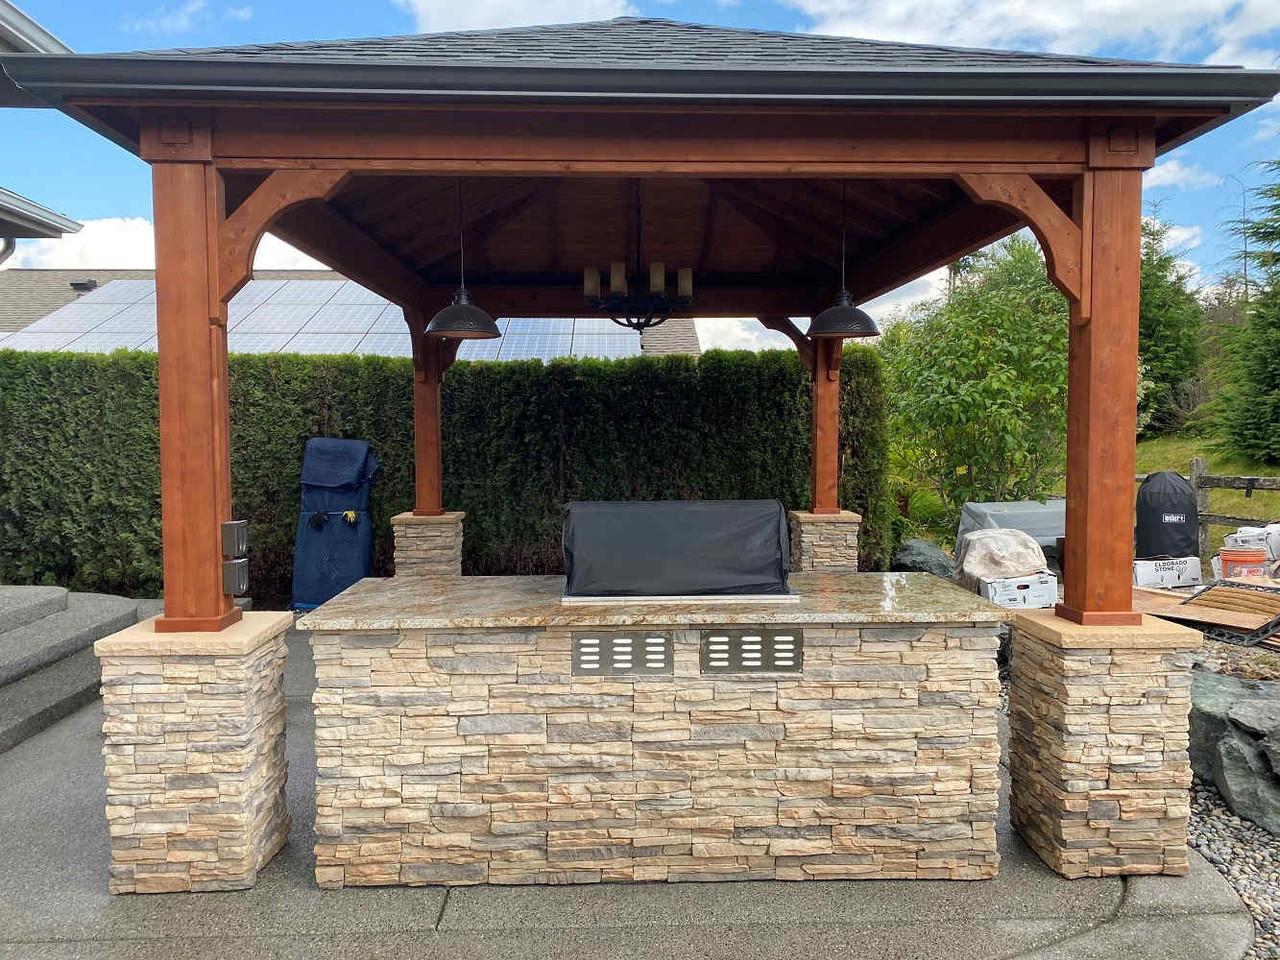 12x16 Traditional Roof Cedar Pavilion Kit, Redmond, WA